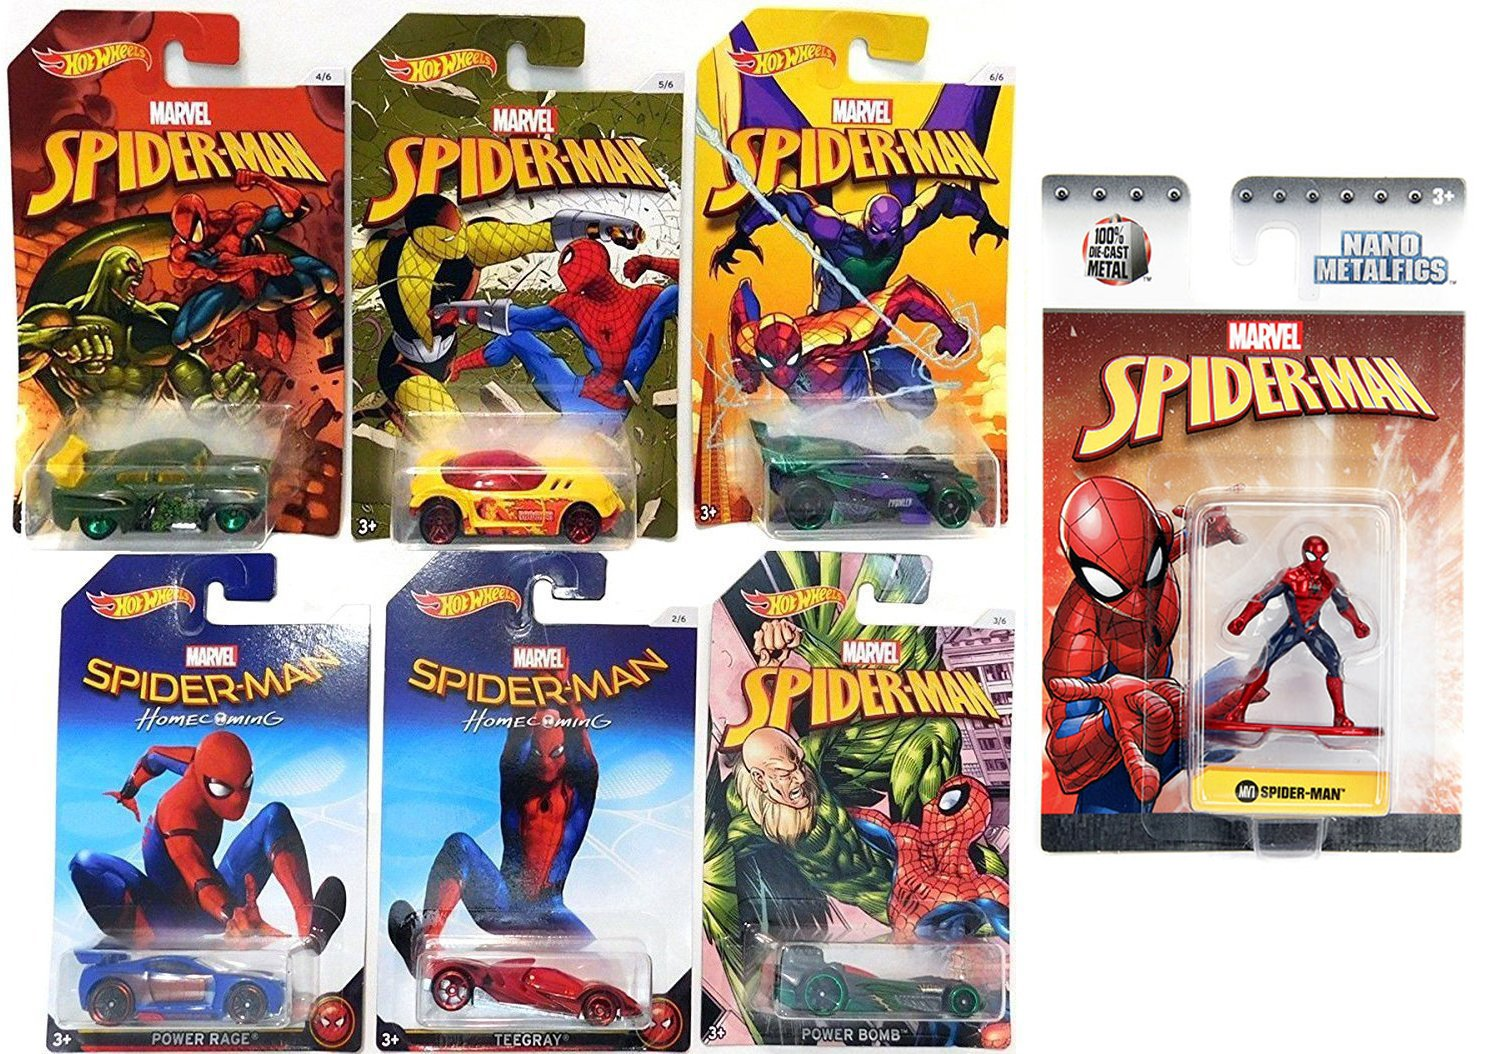 7bc900a2 Amazon.com: Hot Wheels Marvel Spider-Man Homecoming Movie Exclusive set  Collectible 6 car bundle & Marvel Nano Metalfigs Spider-Man 1.5-Inch Diecast  Figure ...